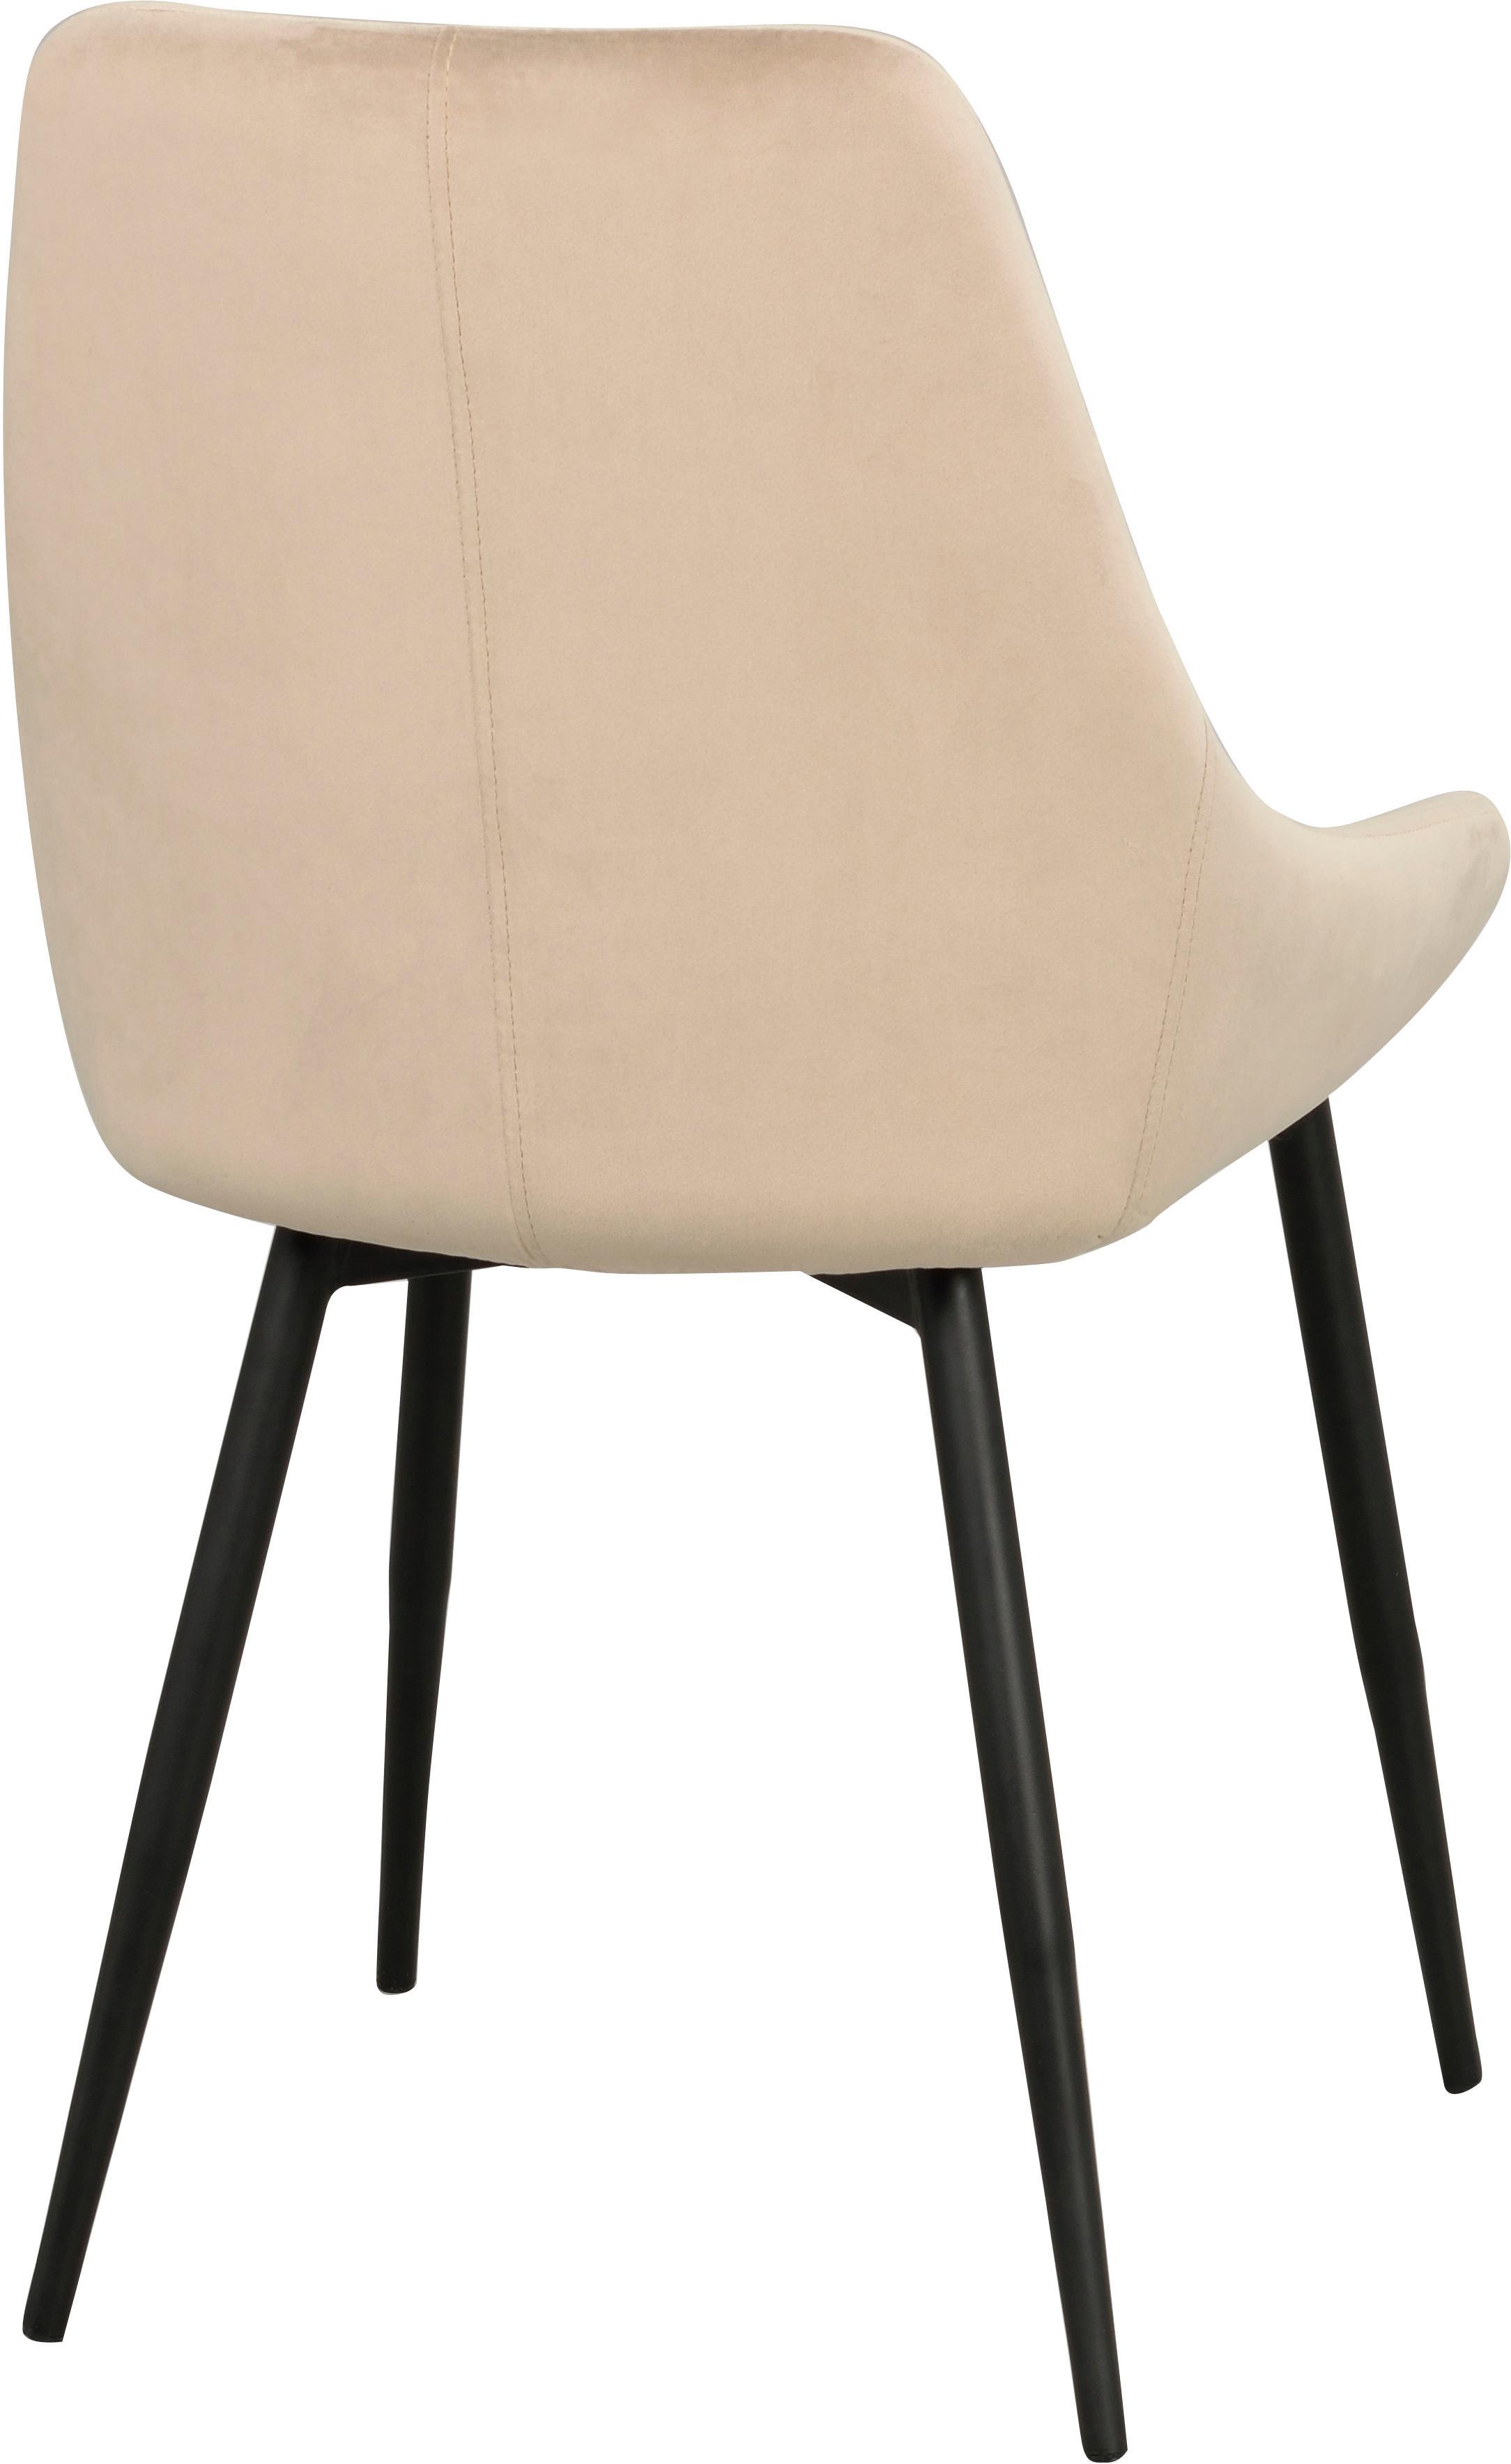 Sillas tapizadas en terciopelo Sierra, 2uds., Tapizado: terciopelo de poliéster 1, Patas: metal pintado, Beige, negro, An 49 x F 55 cm